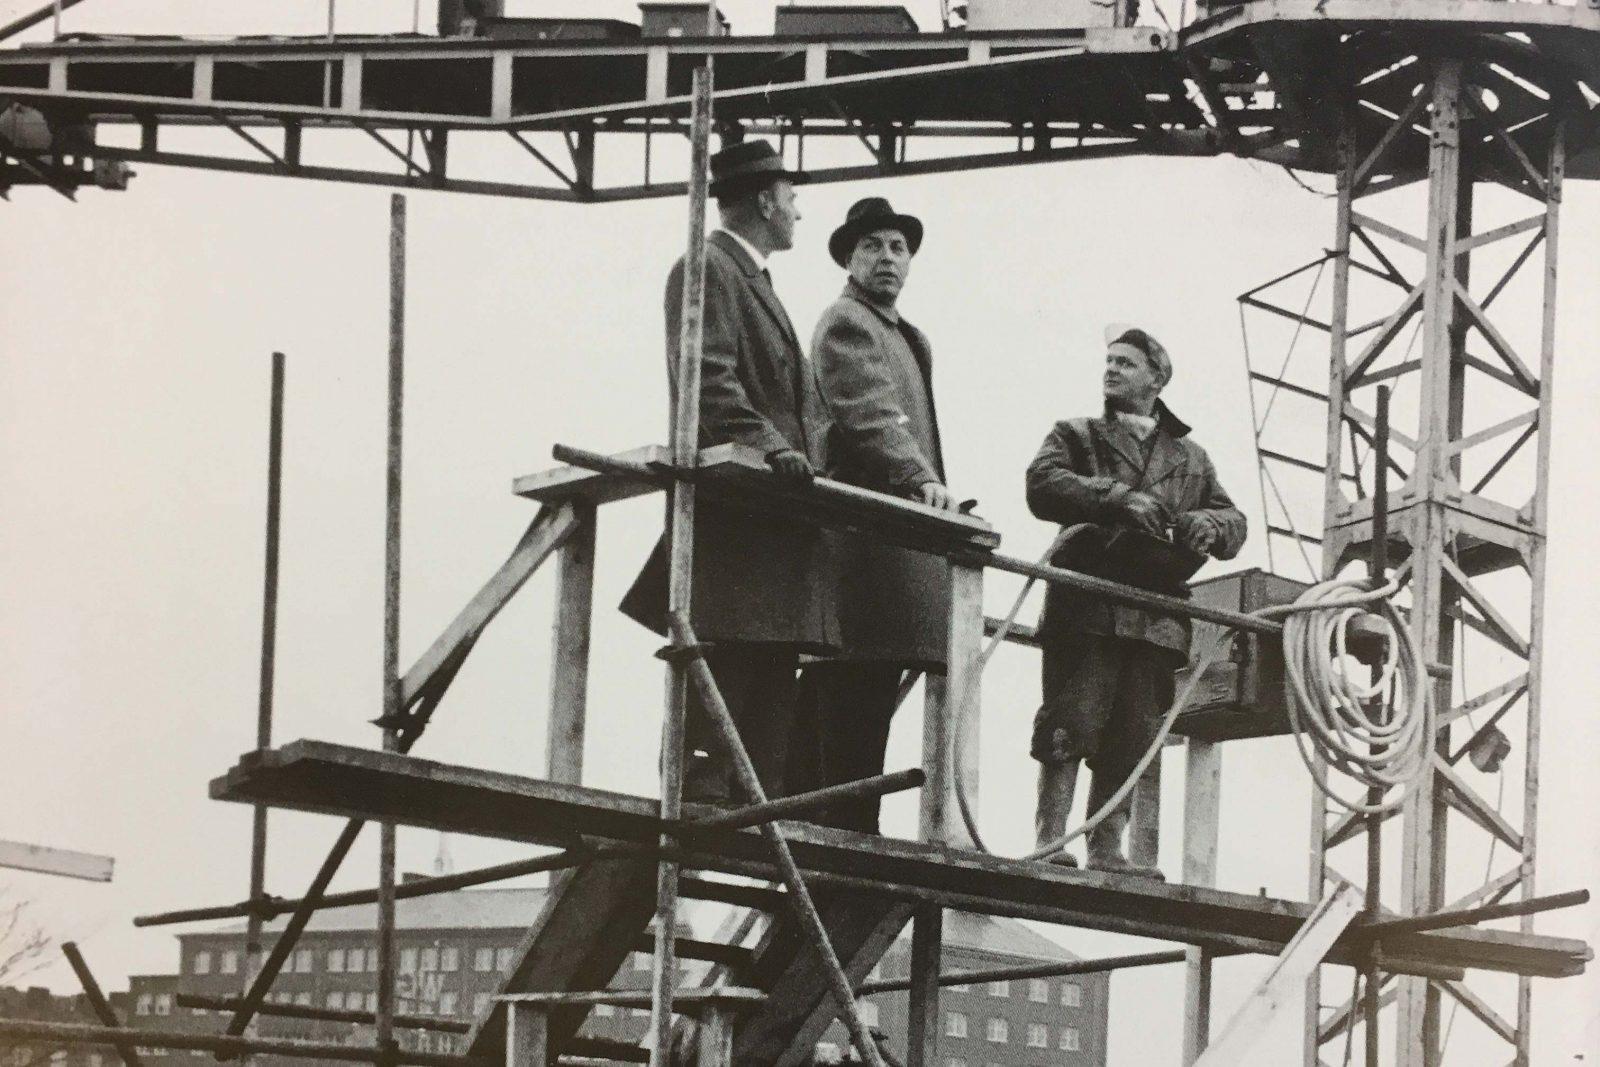 Byggmästare John Mattson på bygge, 1961